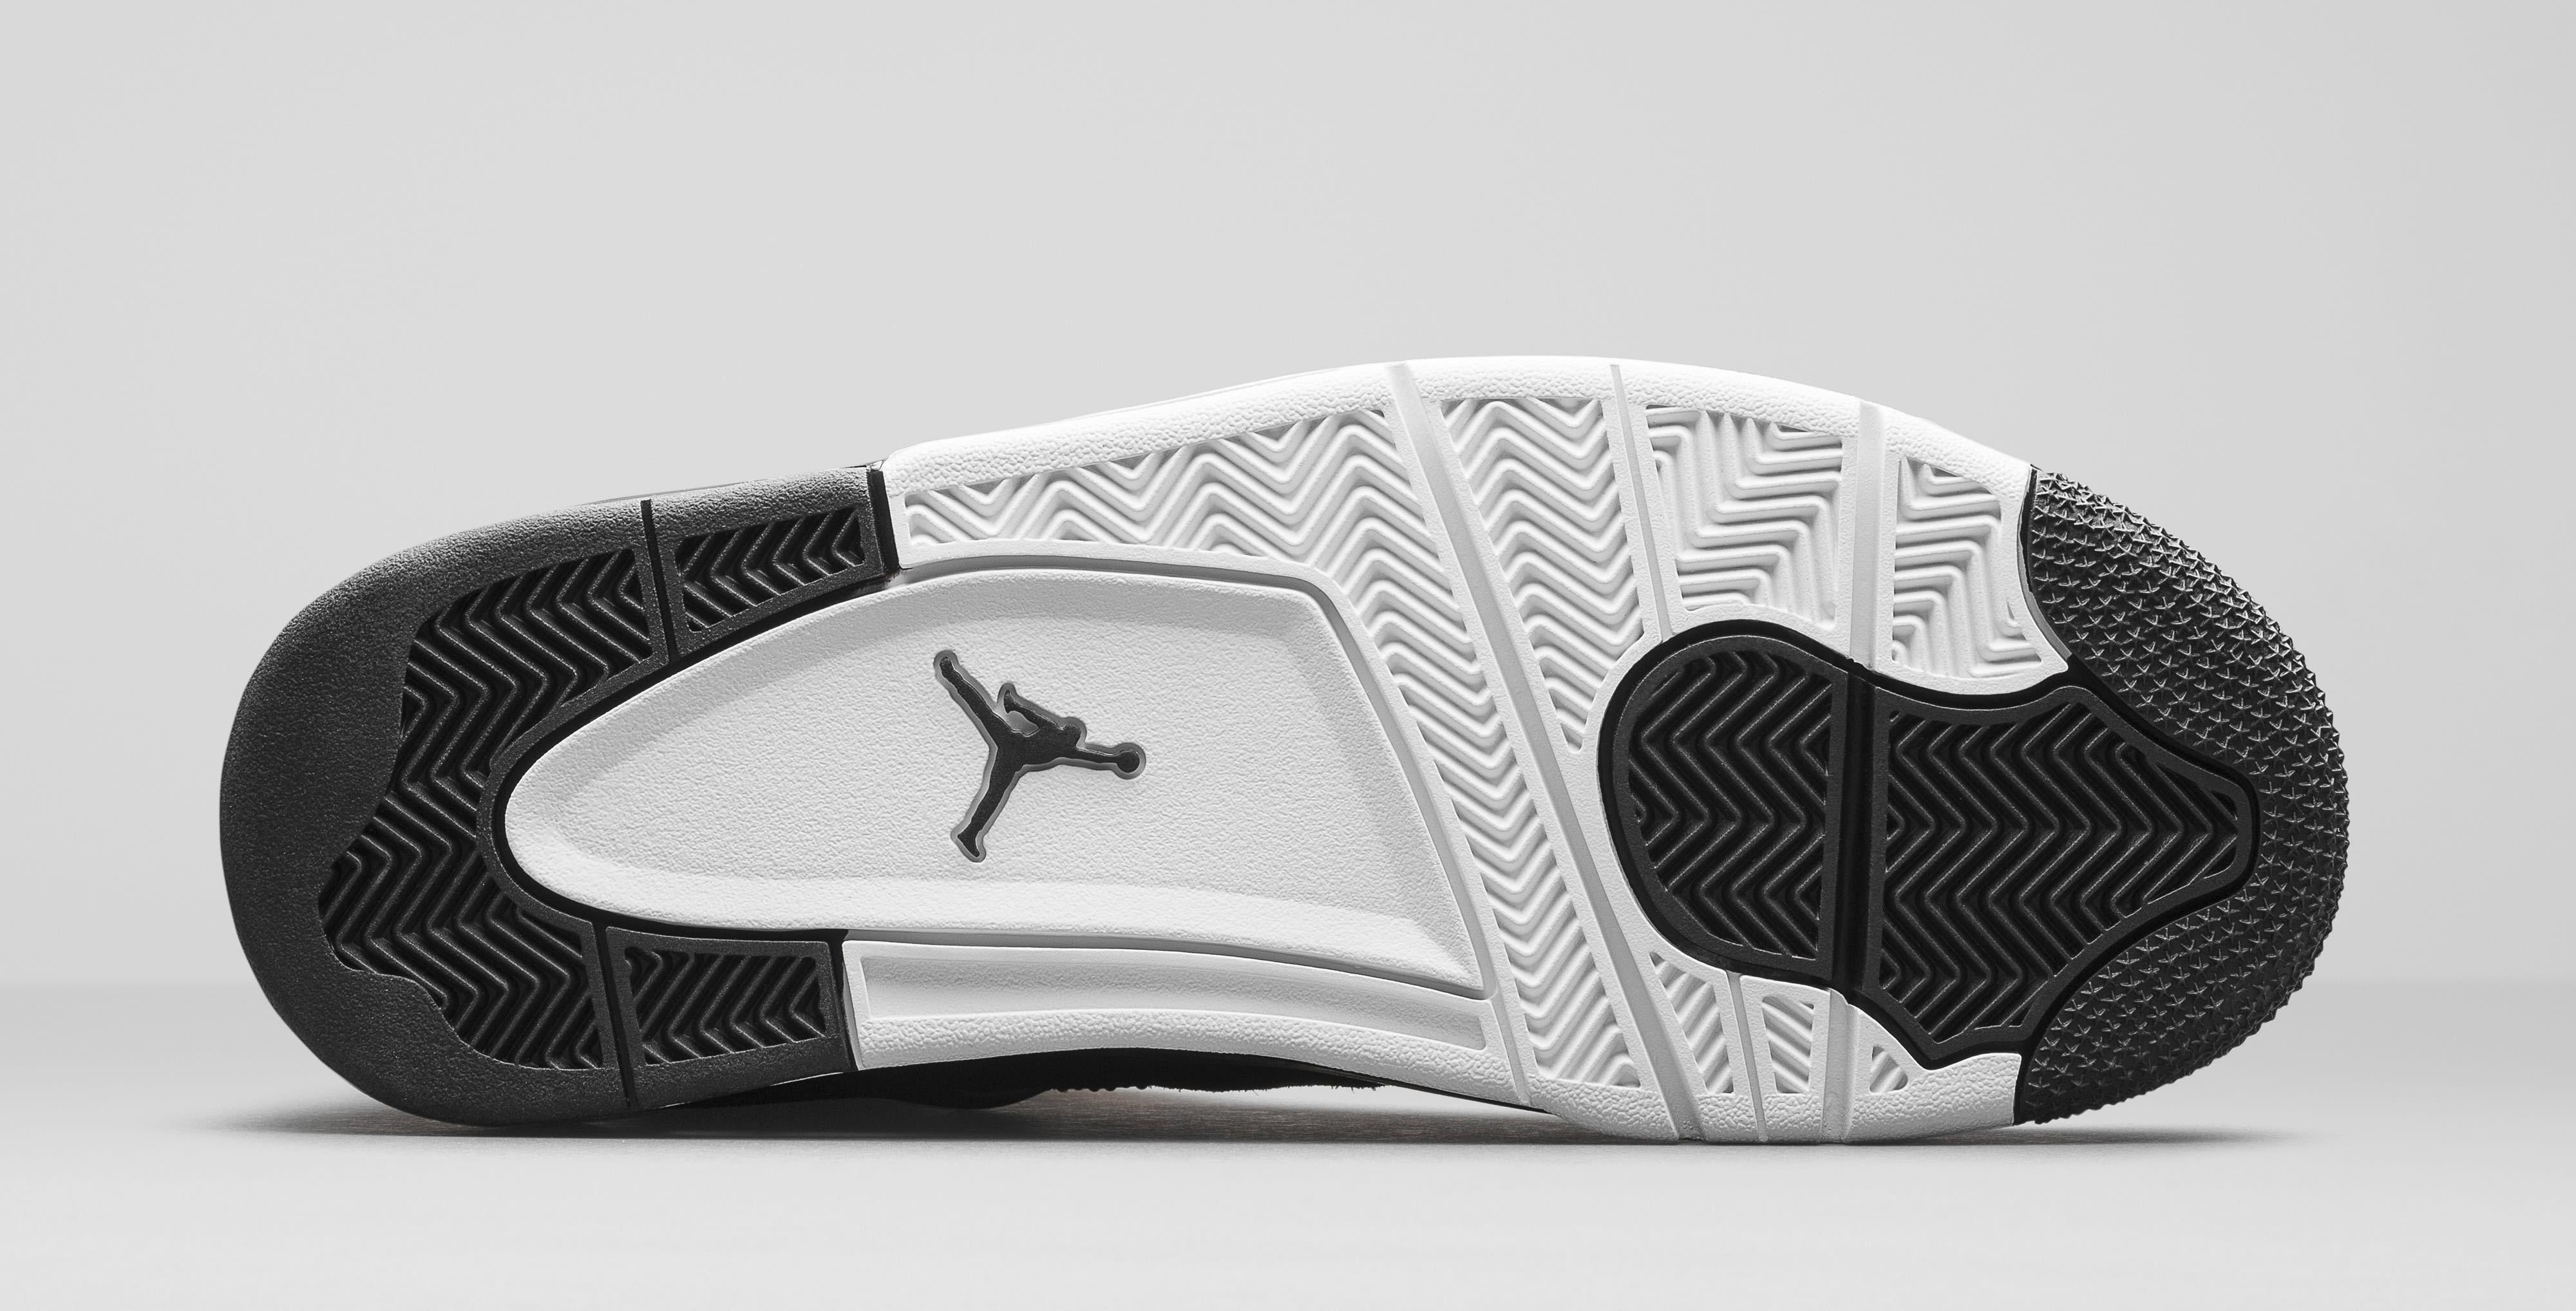 Air Jordan 4 Royalty 308497-032 Sole